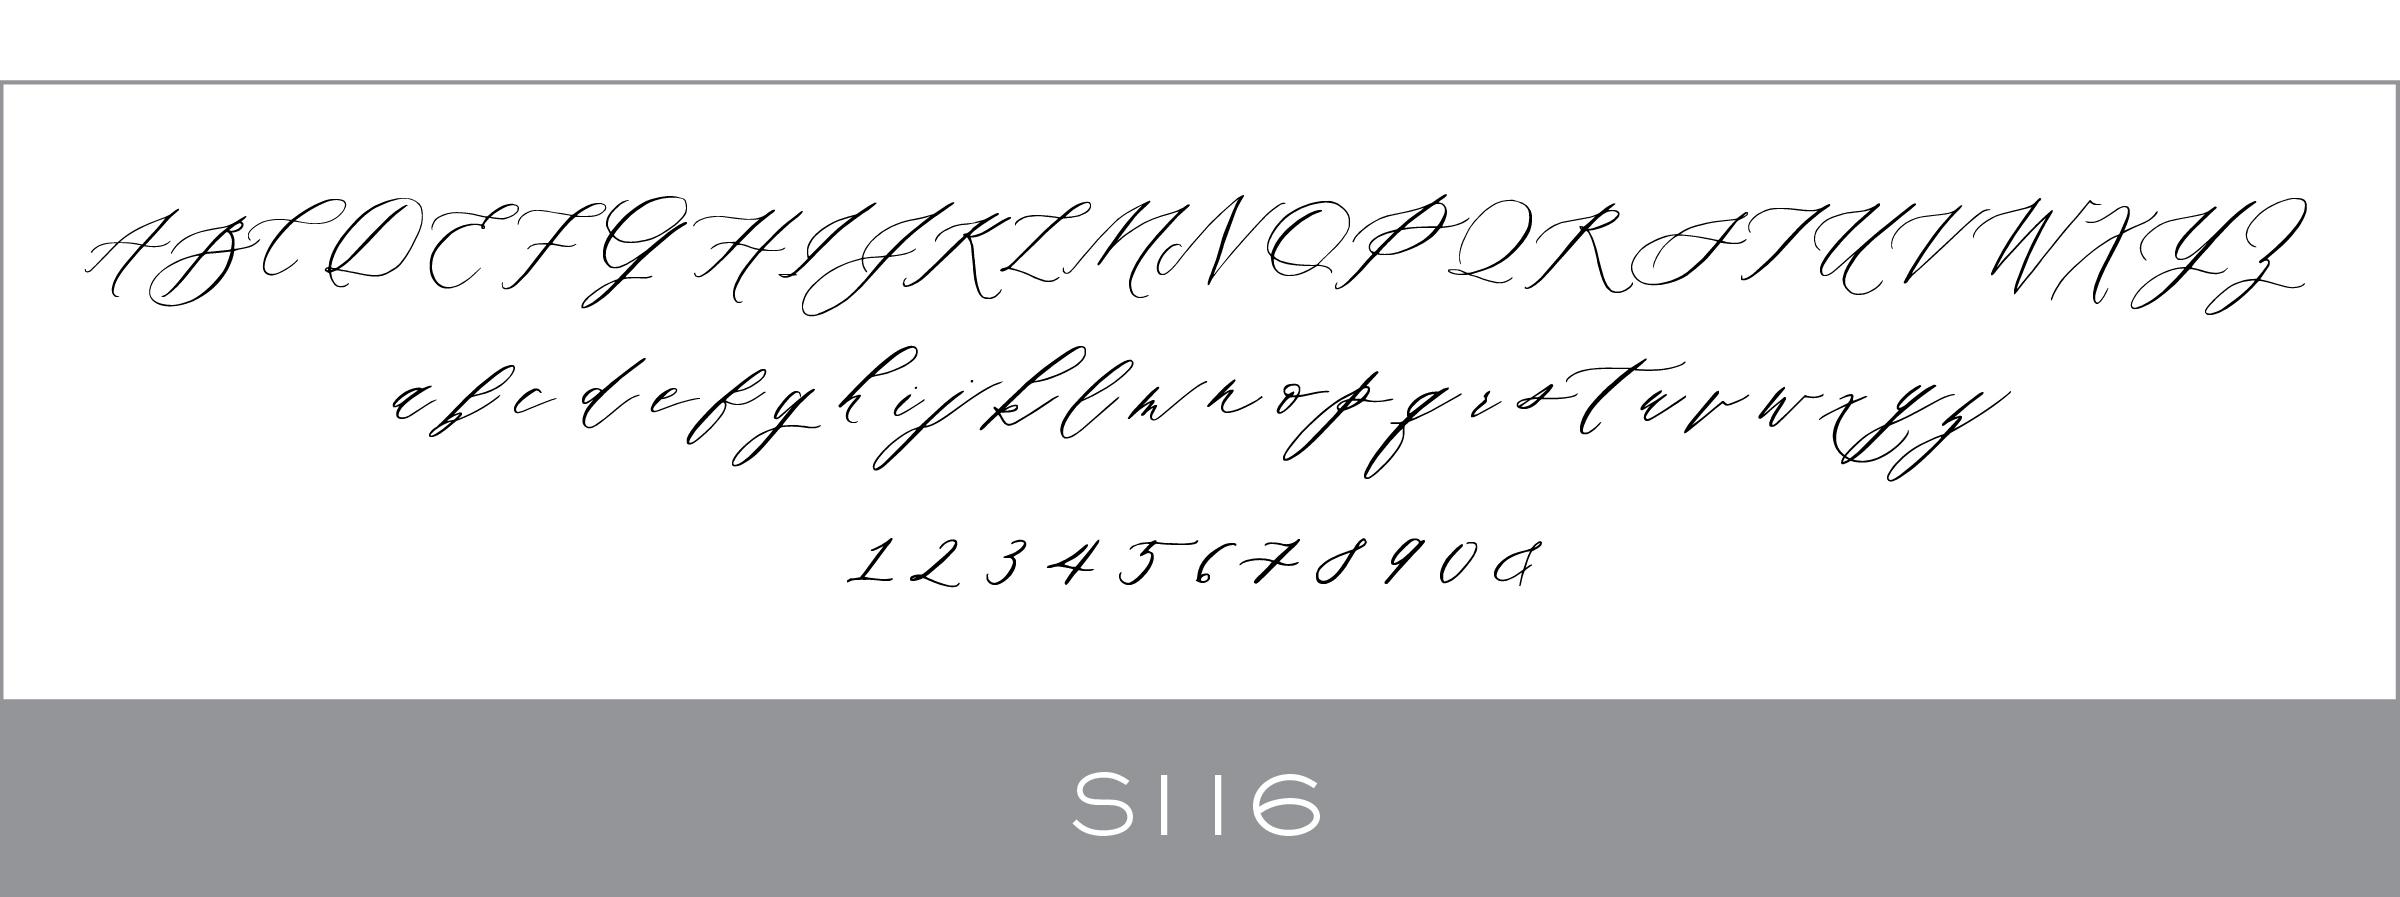 S116_Haute_Papier_Font.jpg